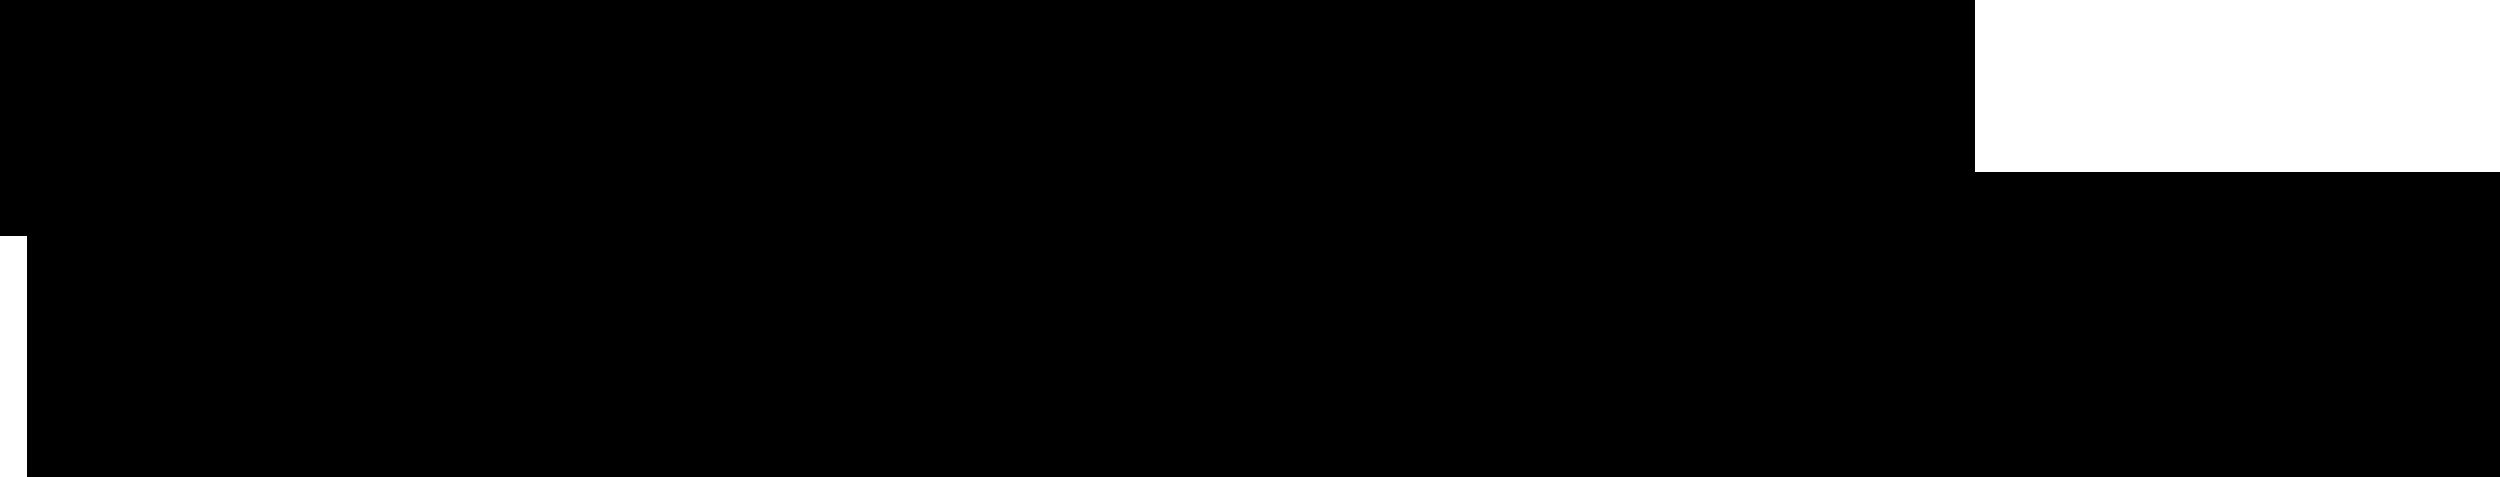 Boundar Dweller Archetype Text.png